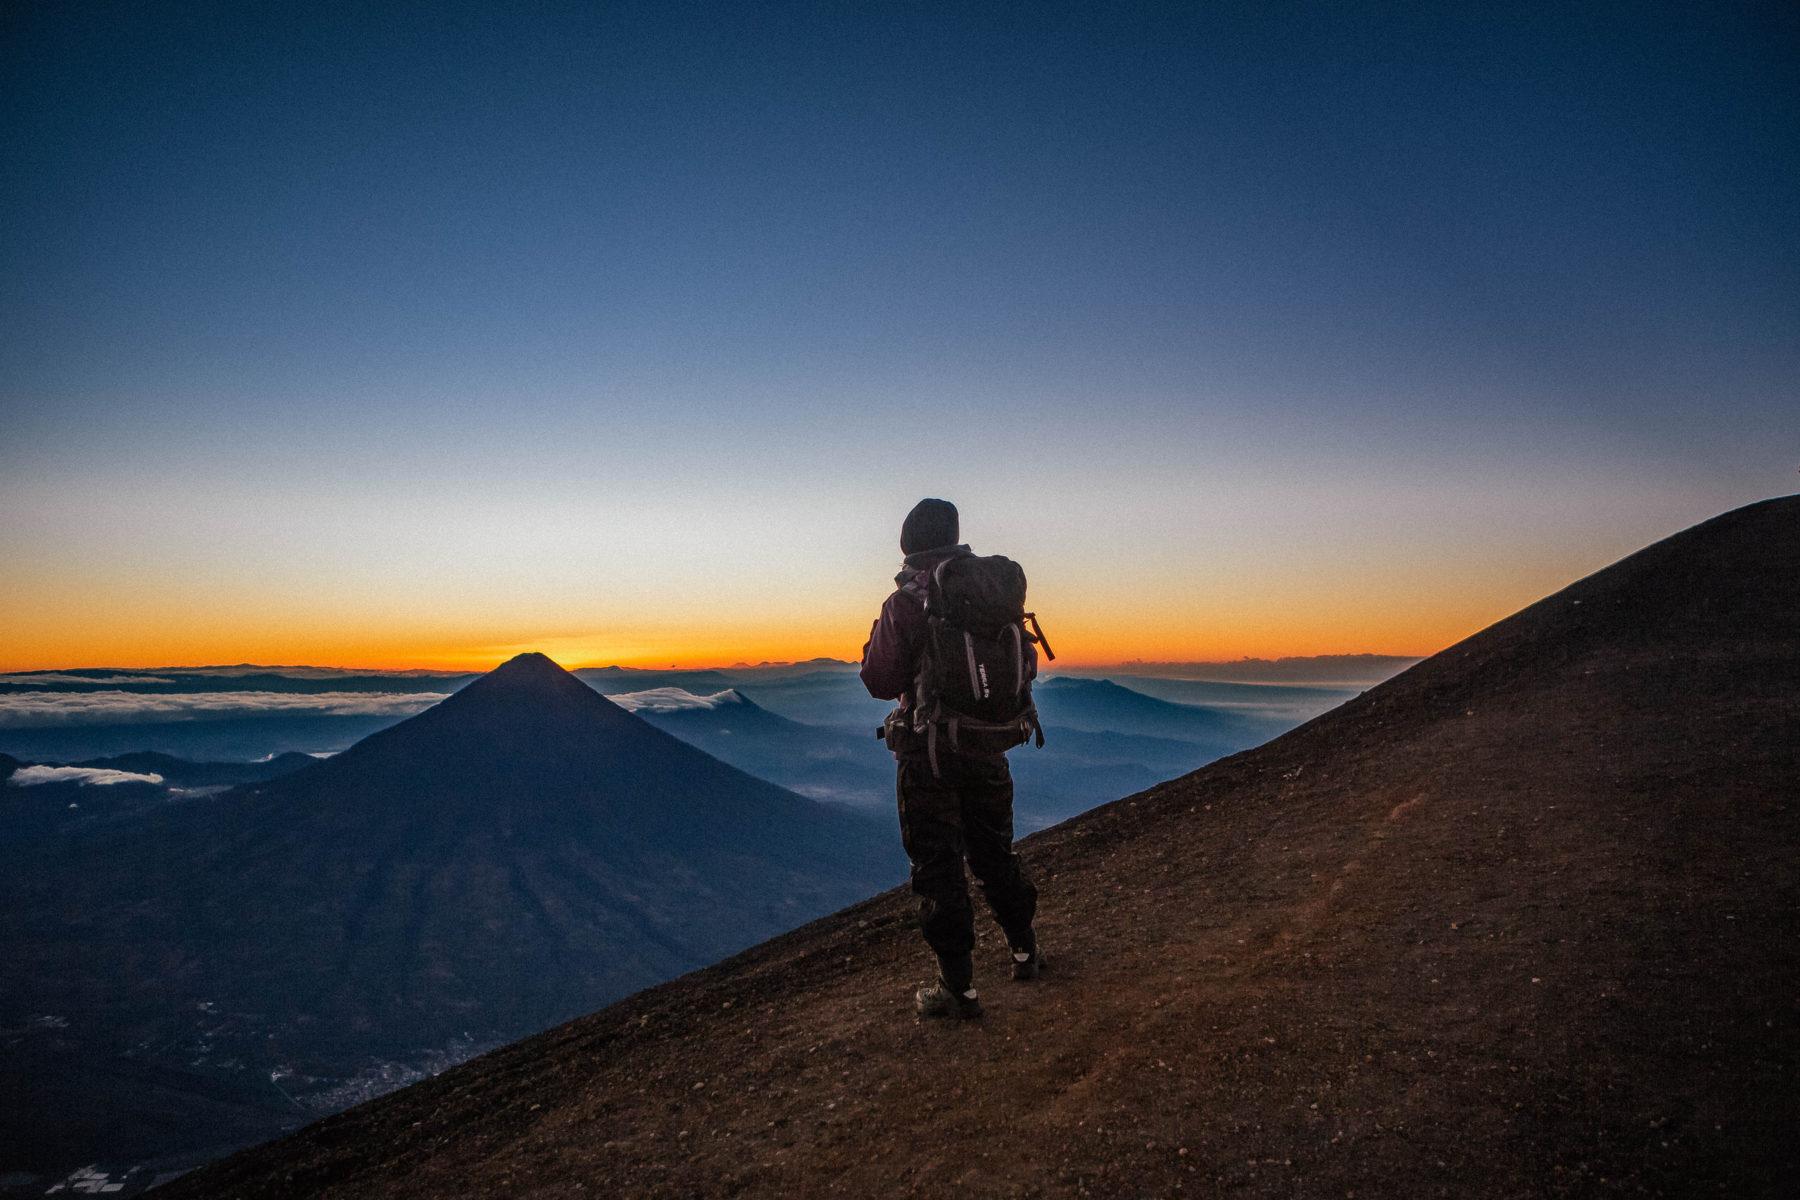 volcano acatenango sunrise tour guatemala central america adventure orange sky